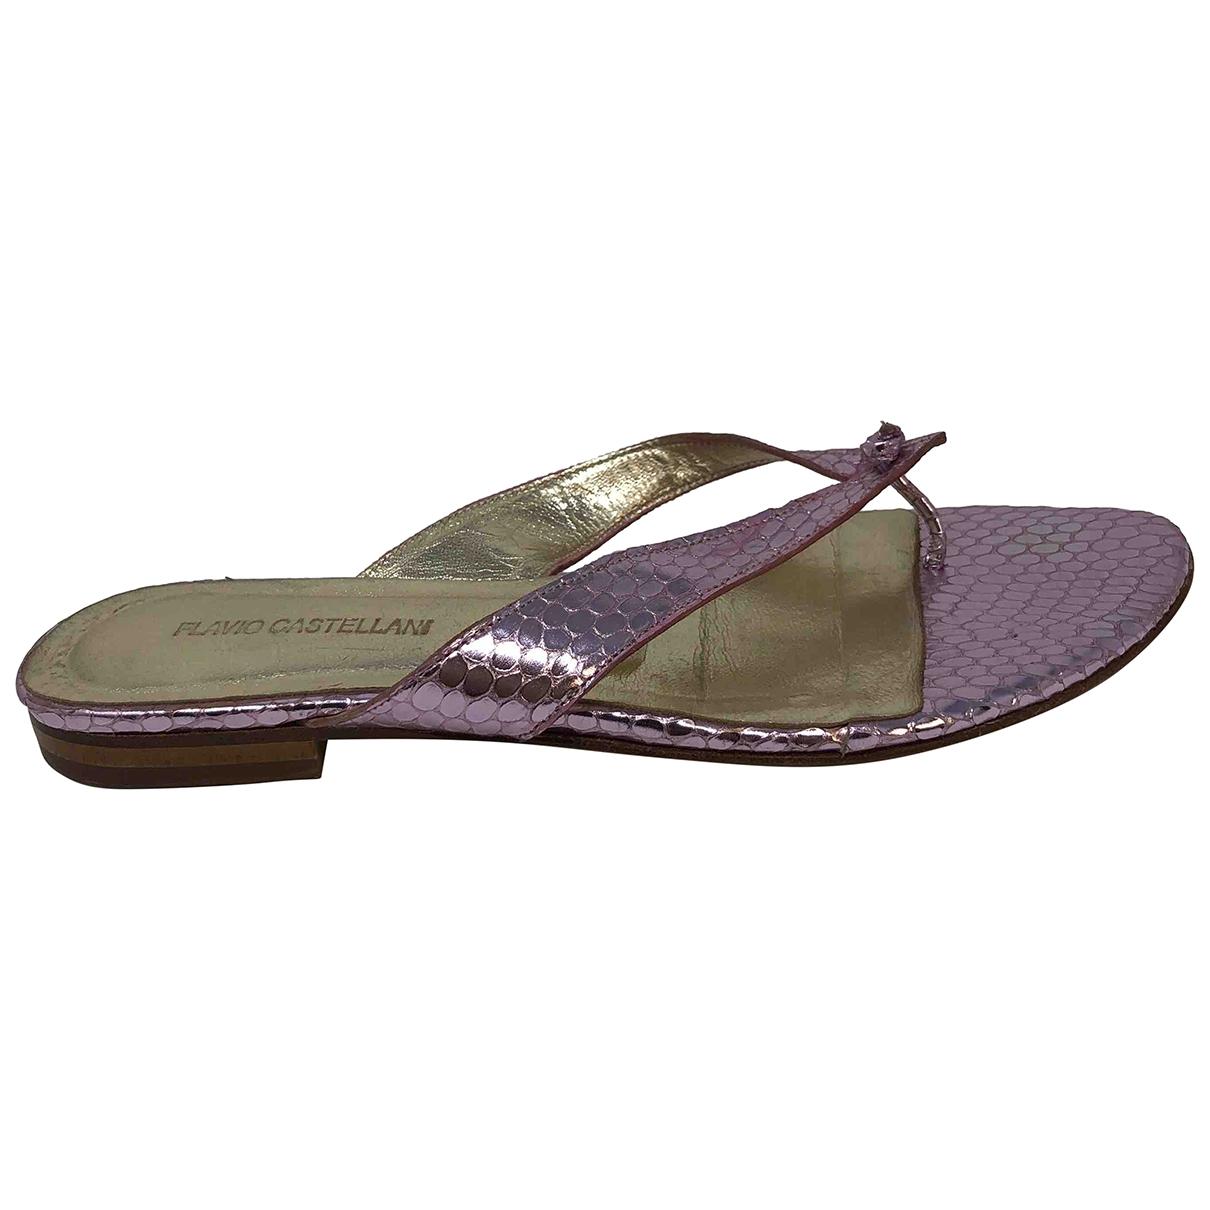 Flavio Castellani \N Metallic Leather Sandals for Women 37 EU